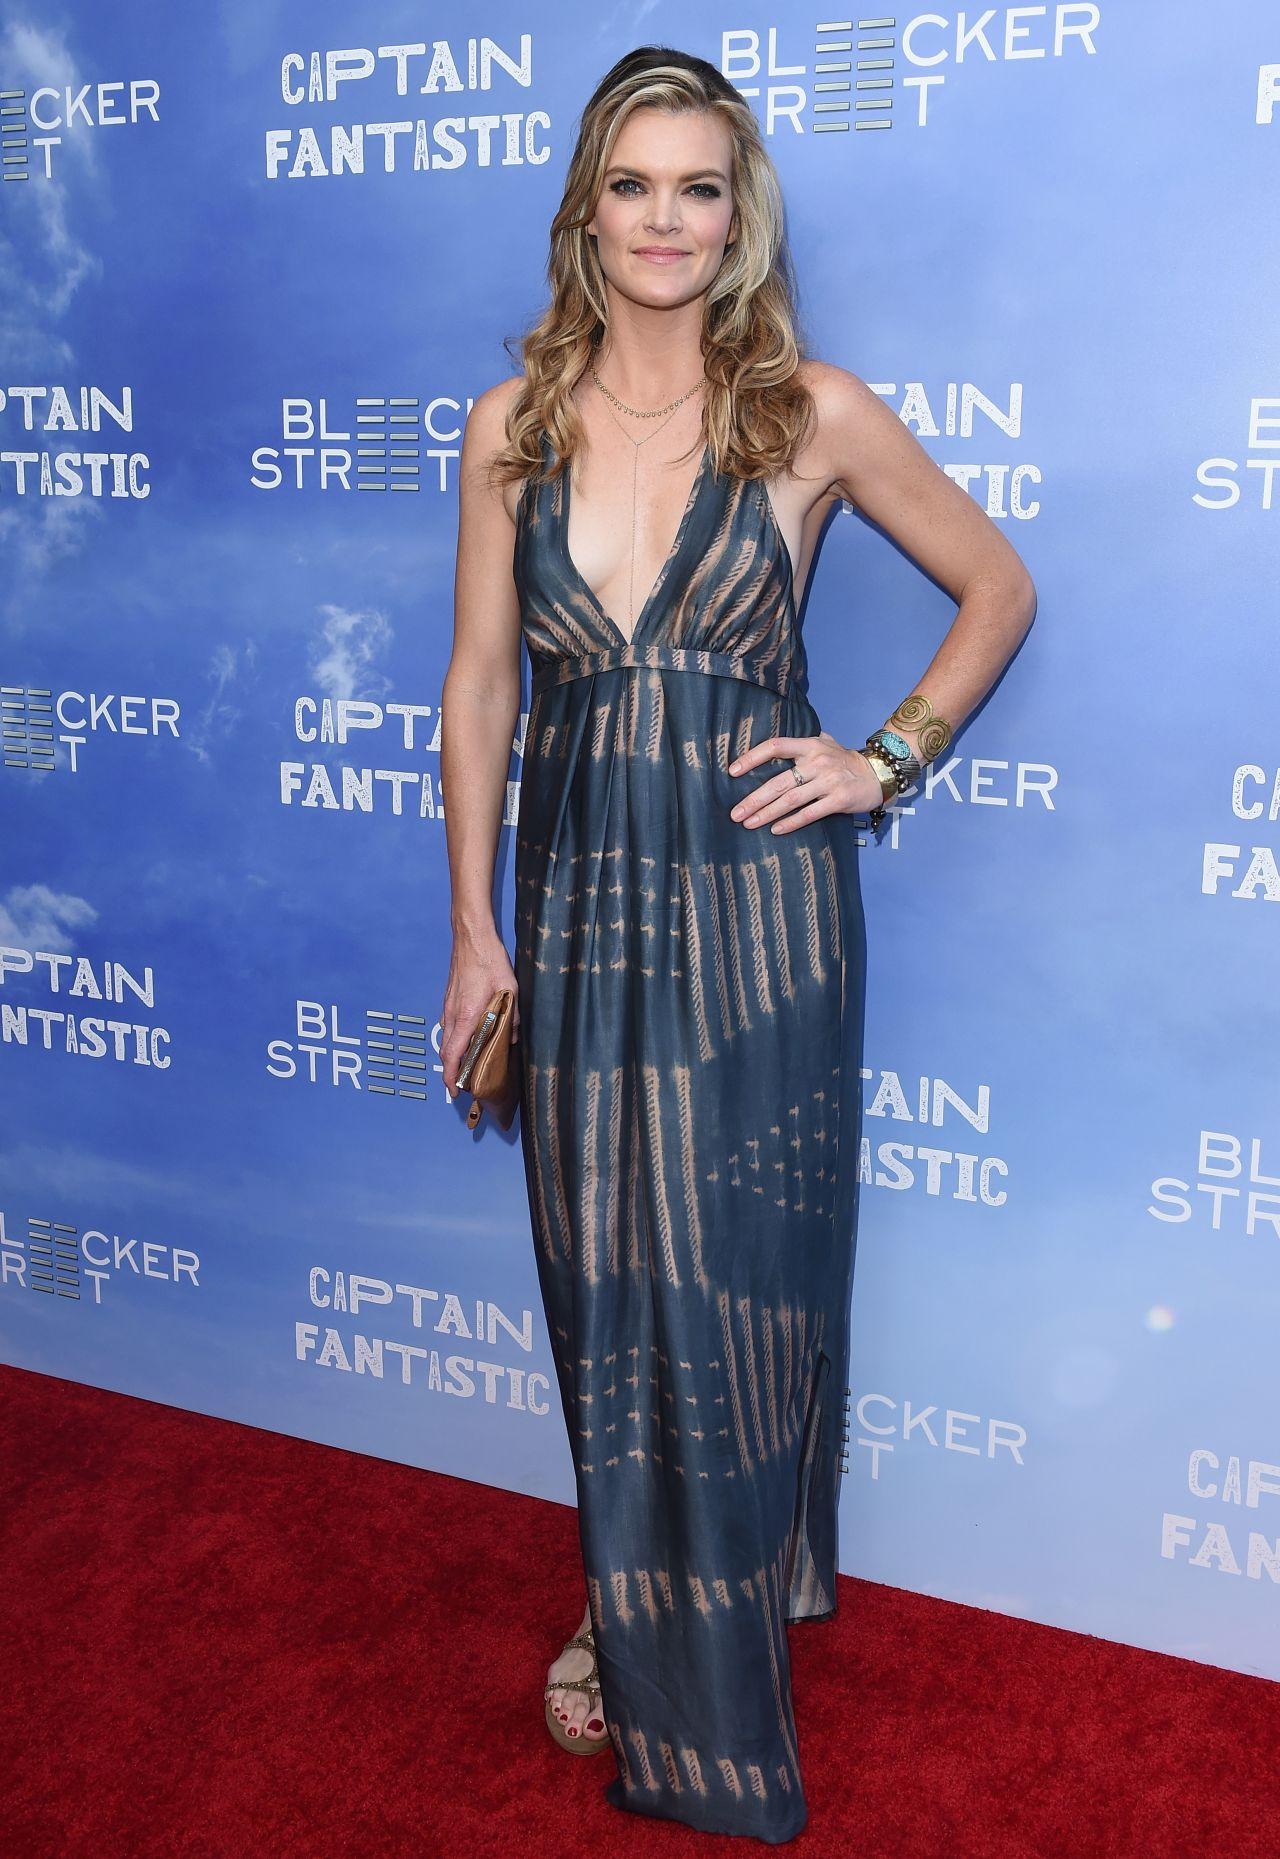 Missi Pyle Captain Fantastic Premiere In Los Angeles 6